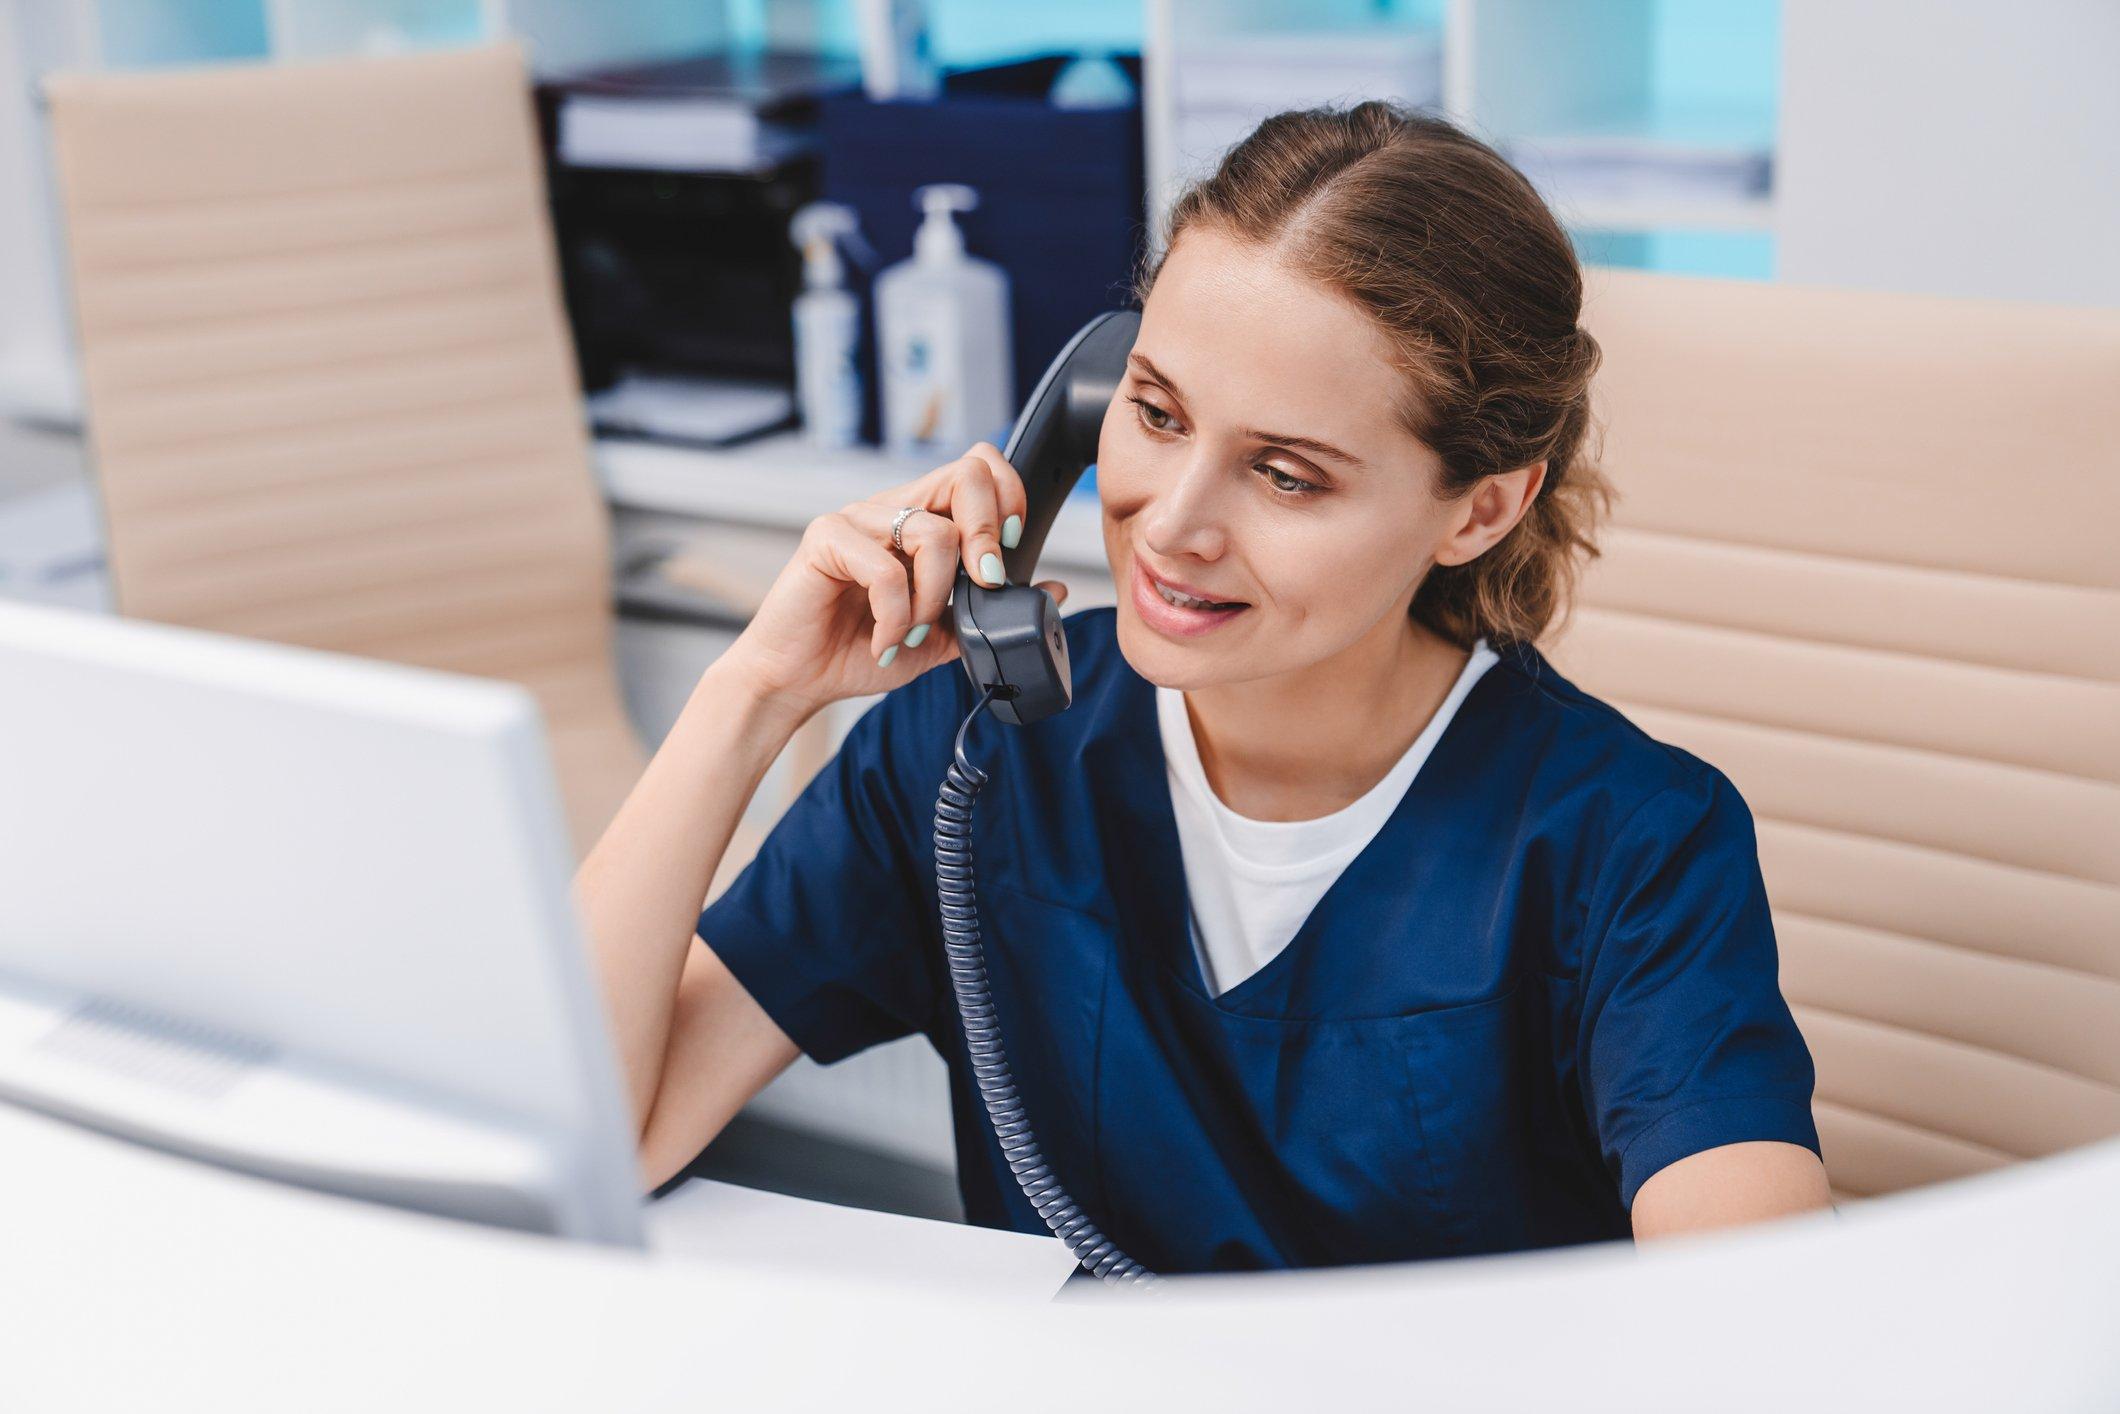 Doctoralia Phone - ferramenta para otimizar clínicas